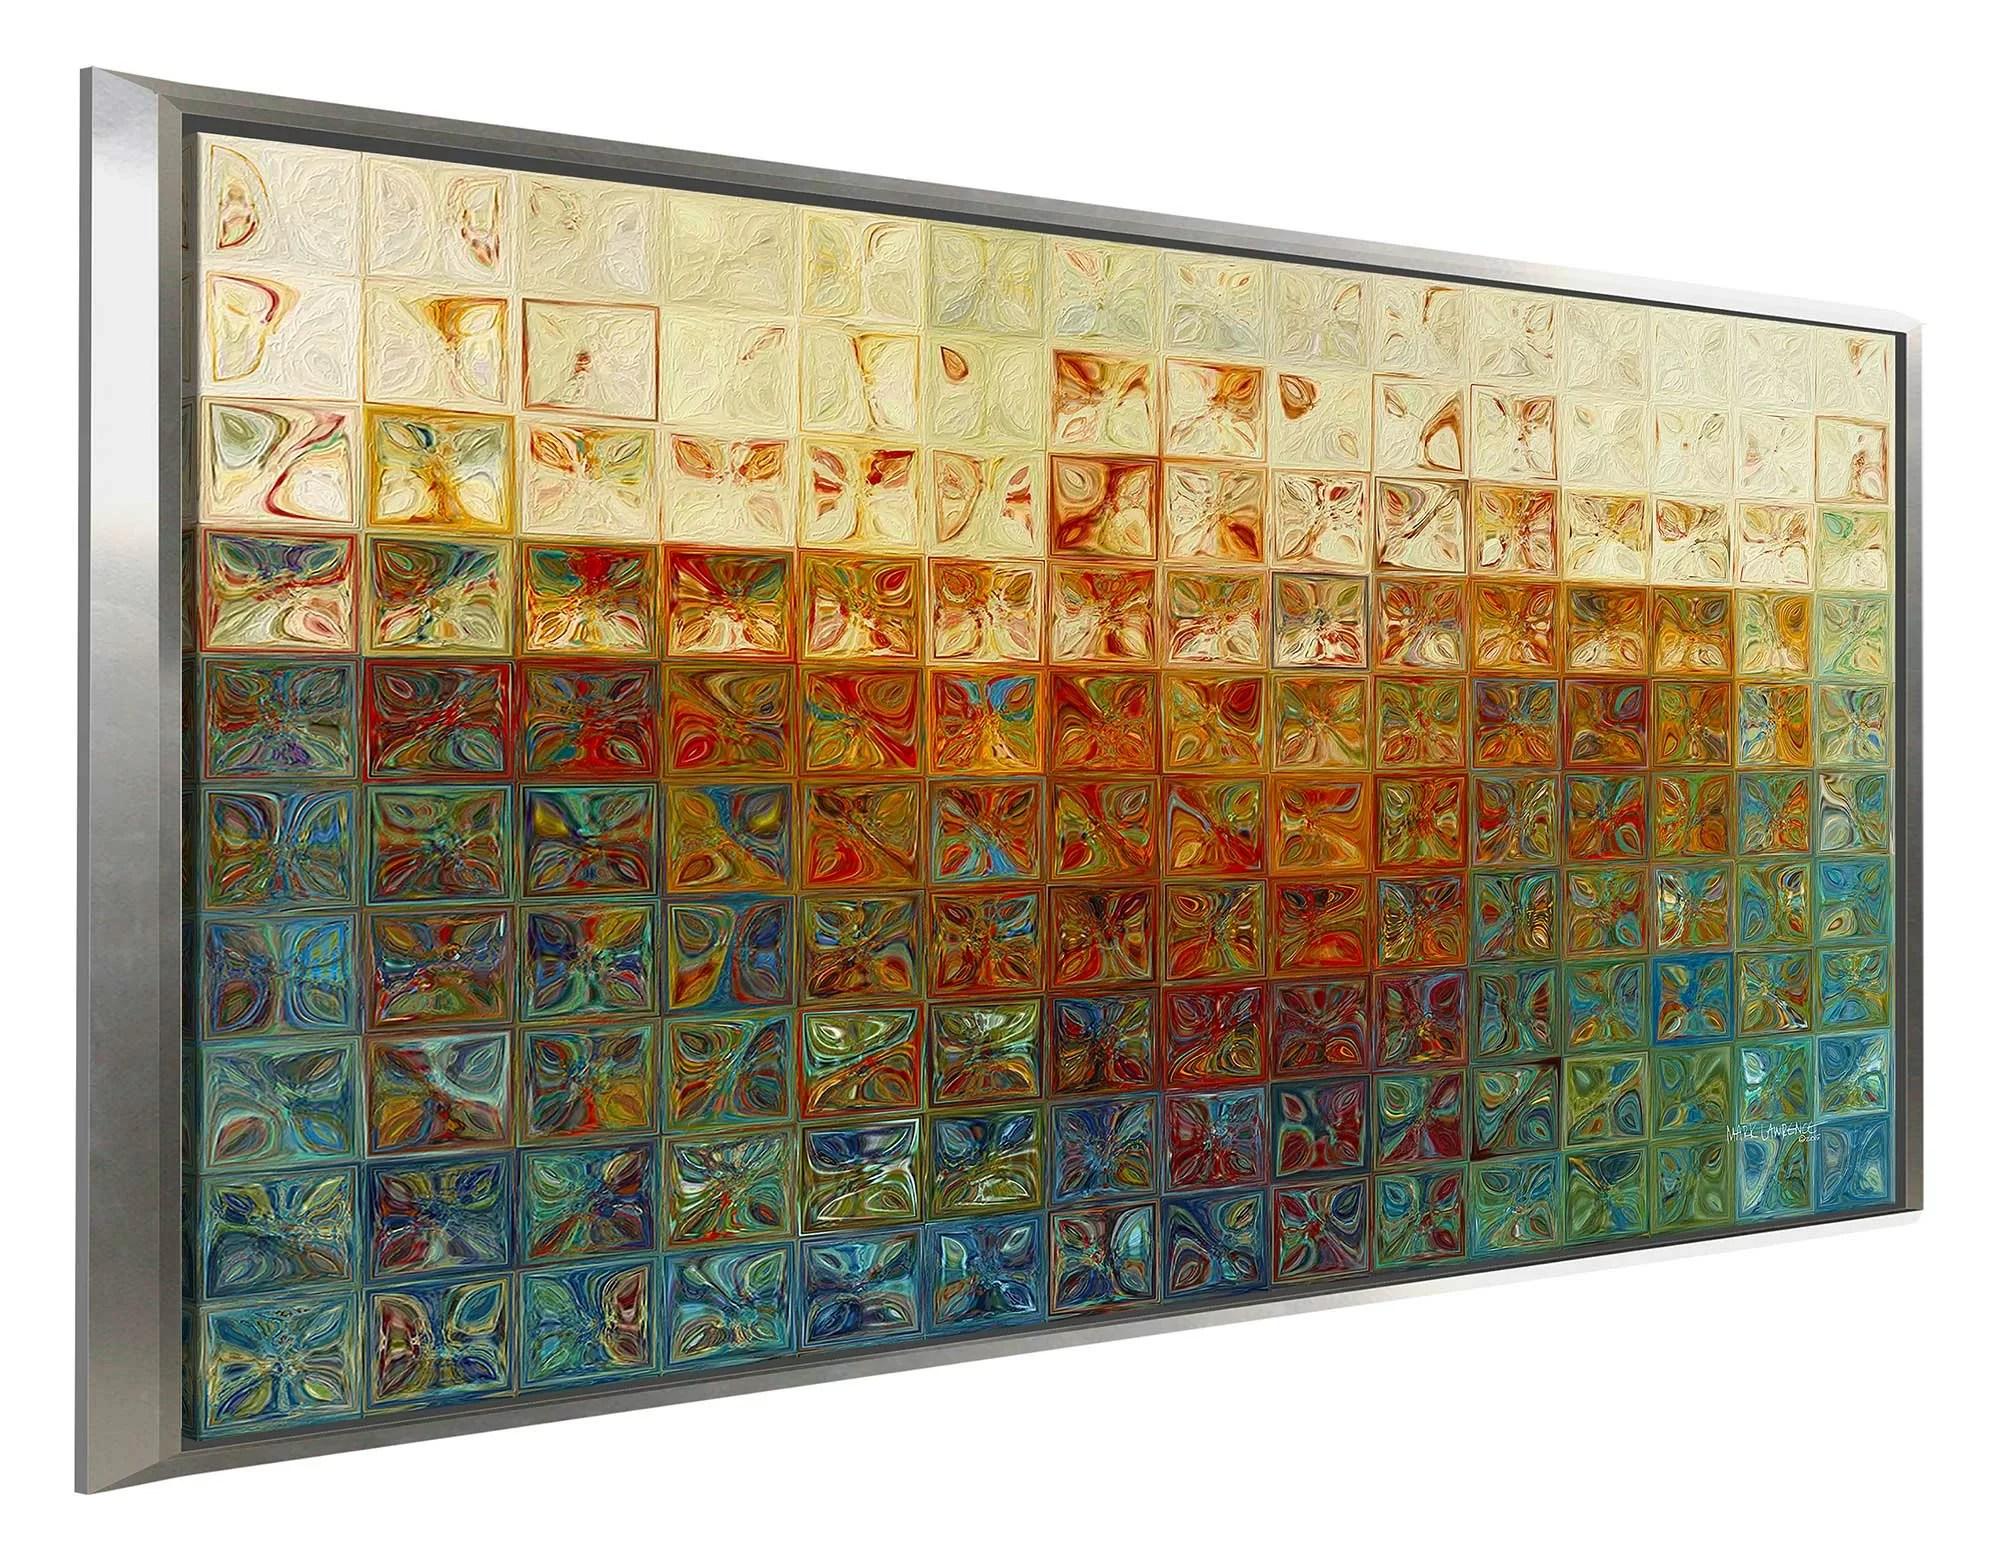 tile wall art 2 2015 framed graphic art print on canvas